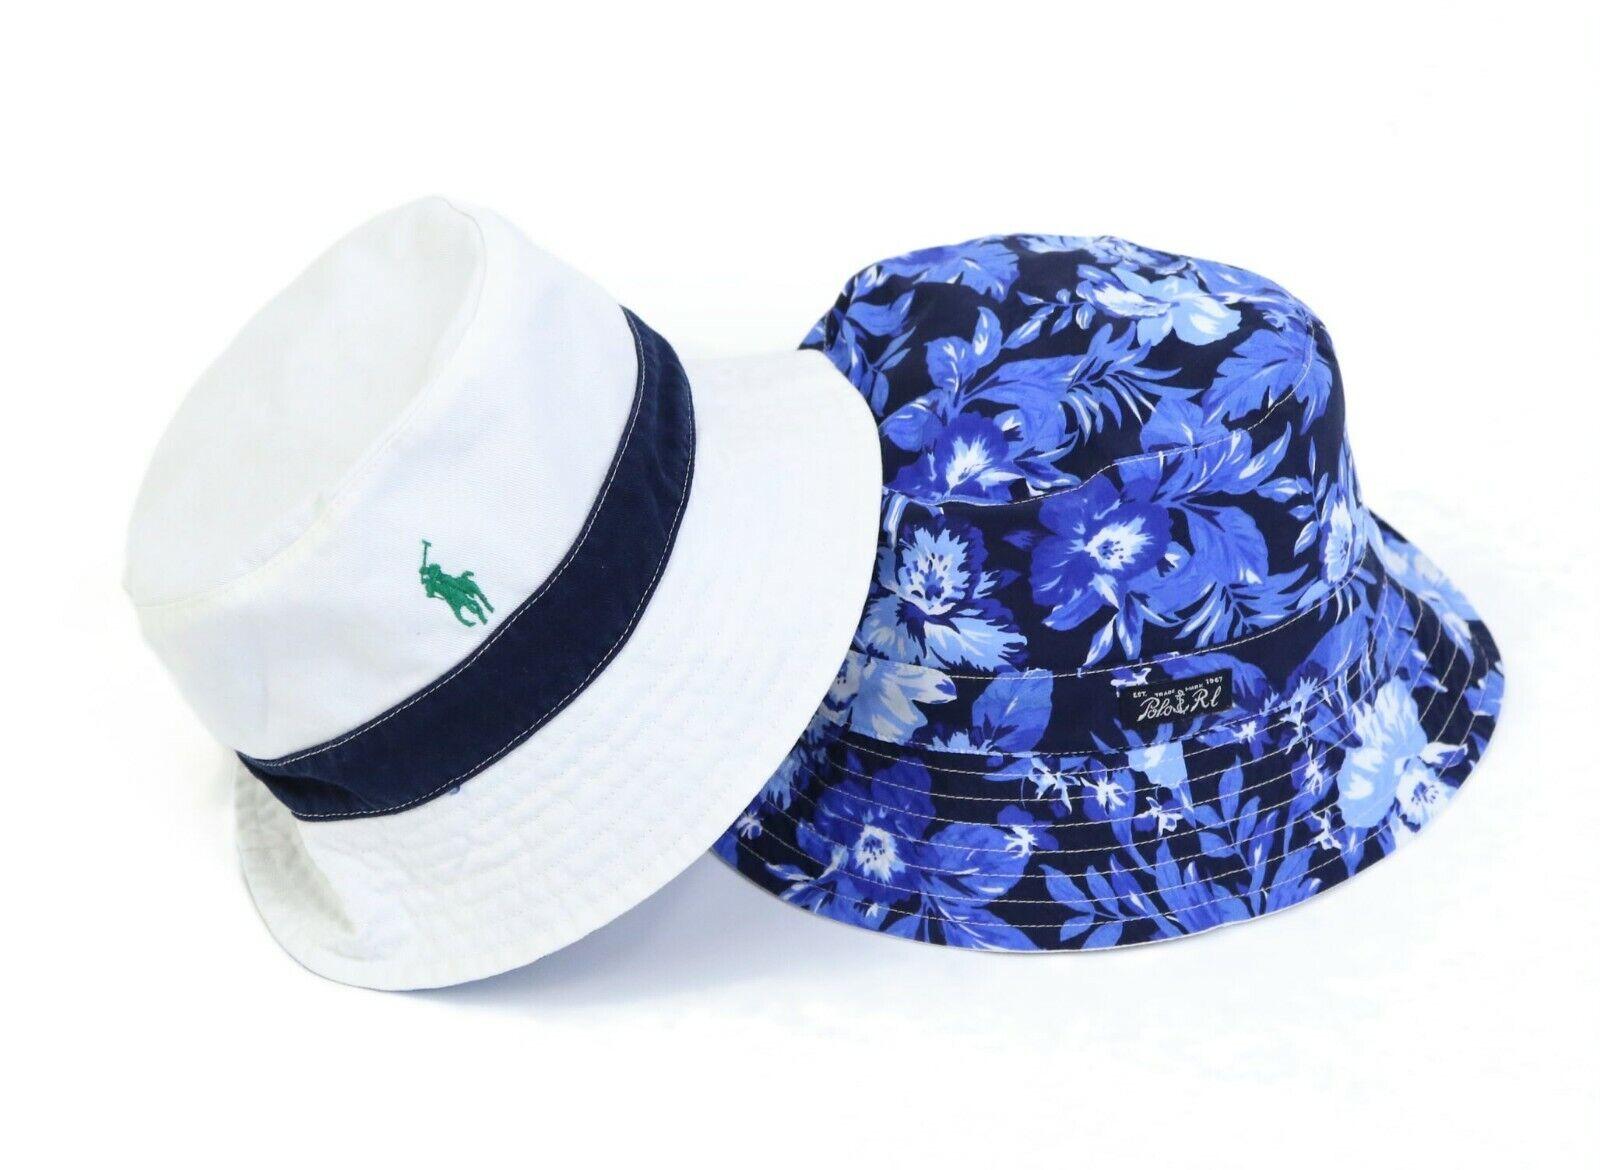 Polo Ralph Lauren Safari Bucket Hat Cap  Floral Aloha Polka Dot  2 colors